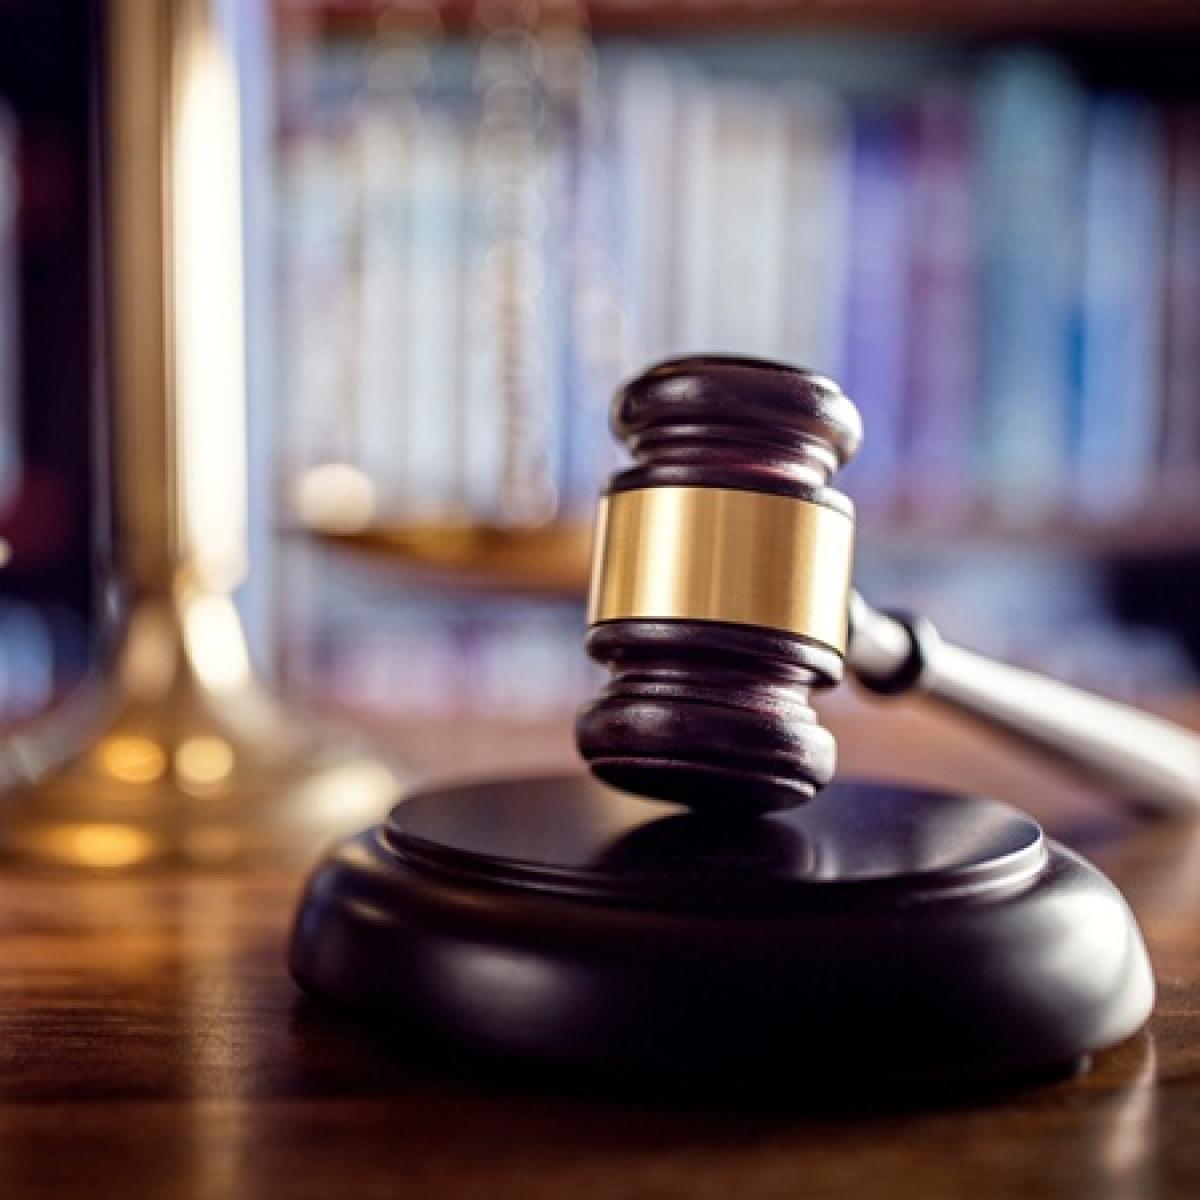 Mumbai: Illegal Bangladeshi immigrant and an 'agent' granted bail